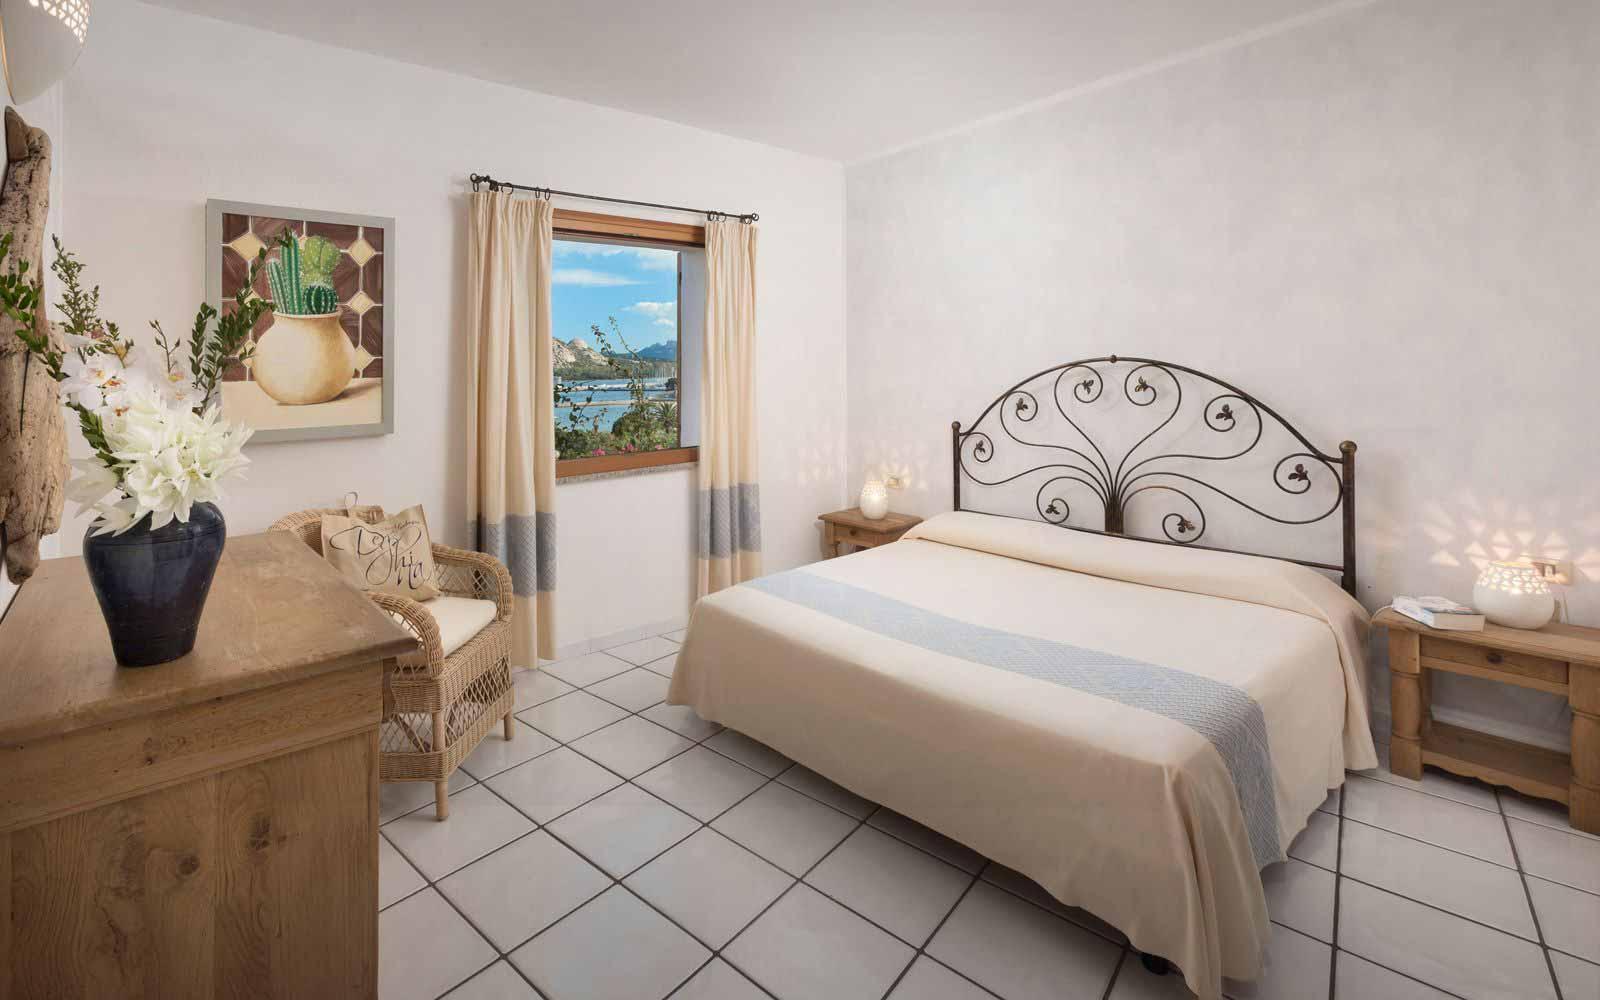 Bedroom at Resort Cala di Falco - Villas